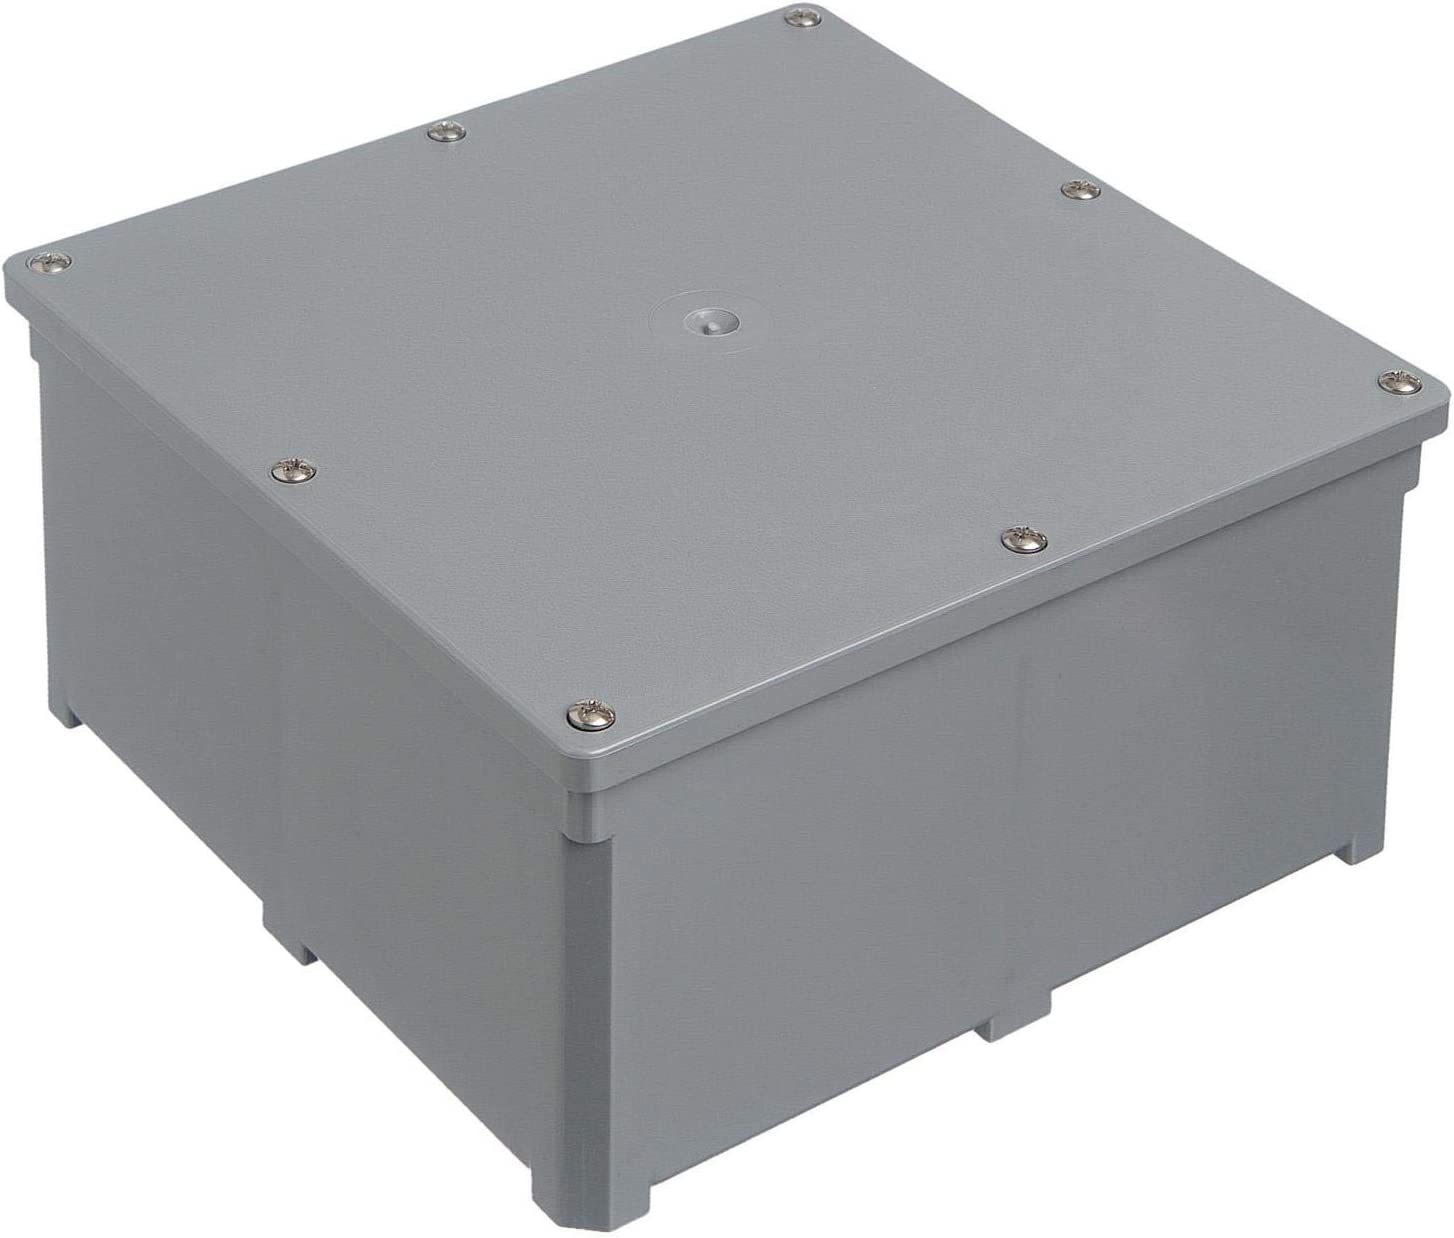 Cantex Junction Box 4x4x2 bulk